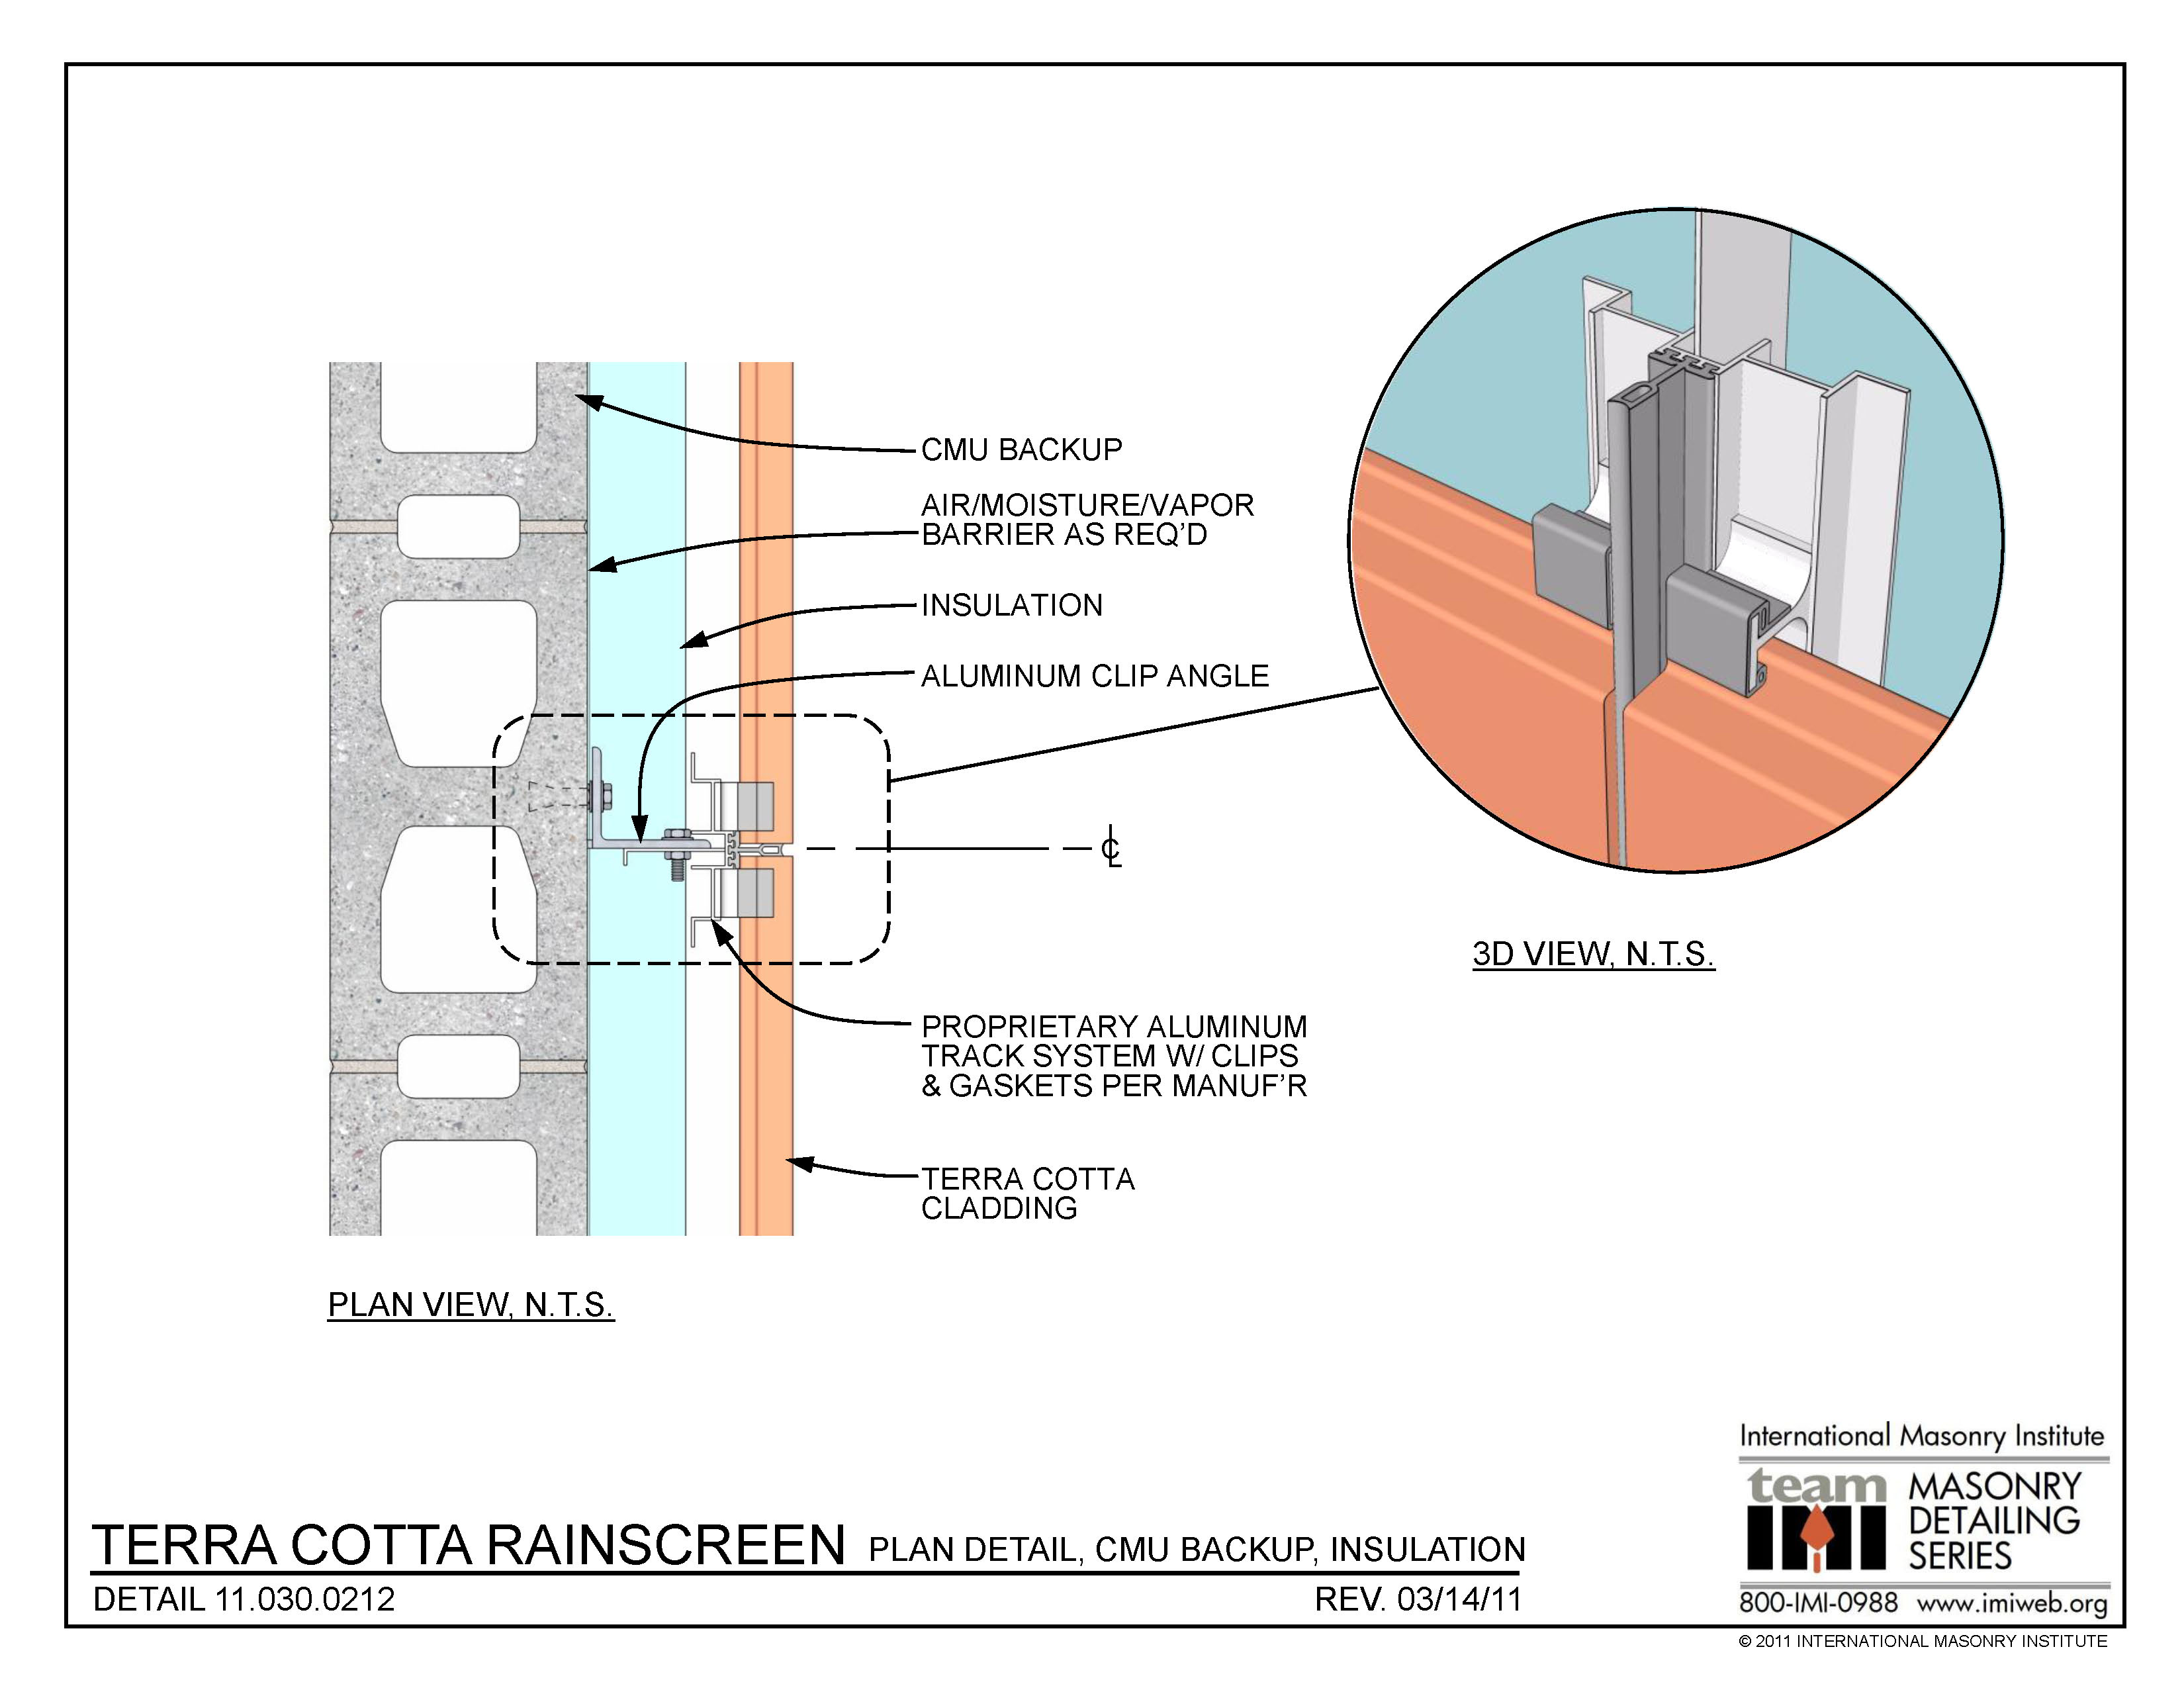 11 030 0212 Terra Cotta Rainscreen Plan Detail Cmu